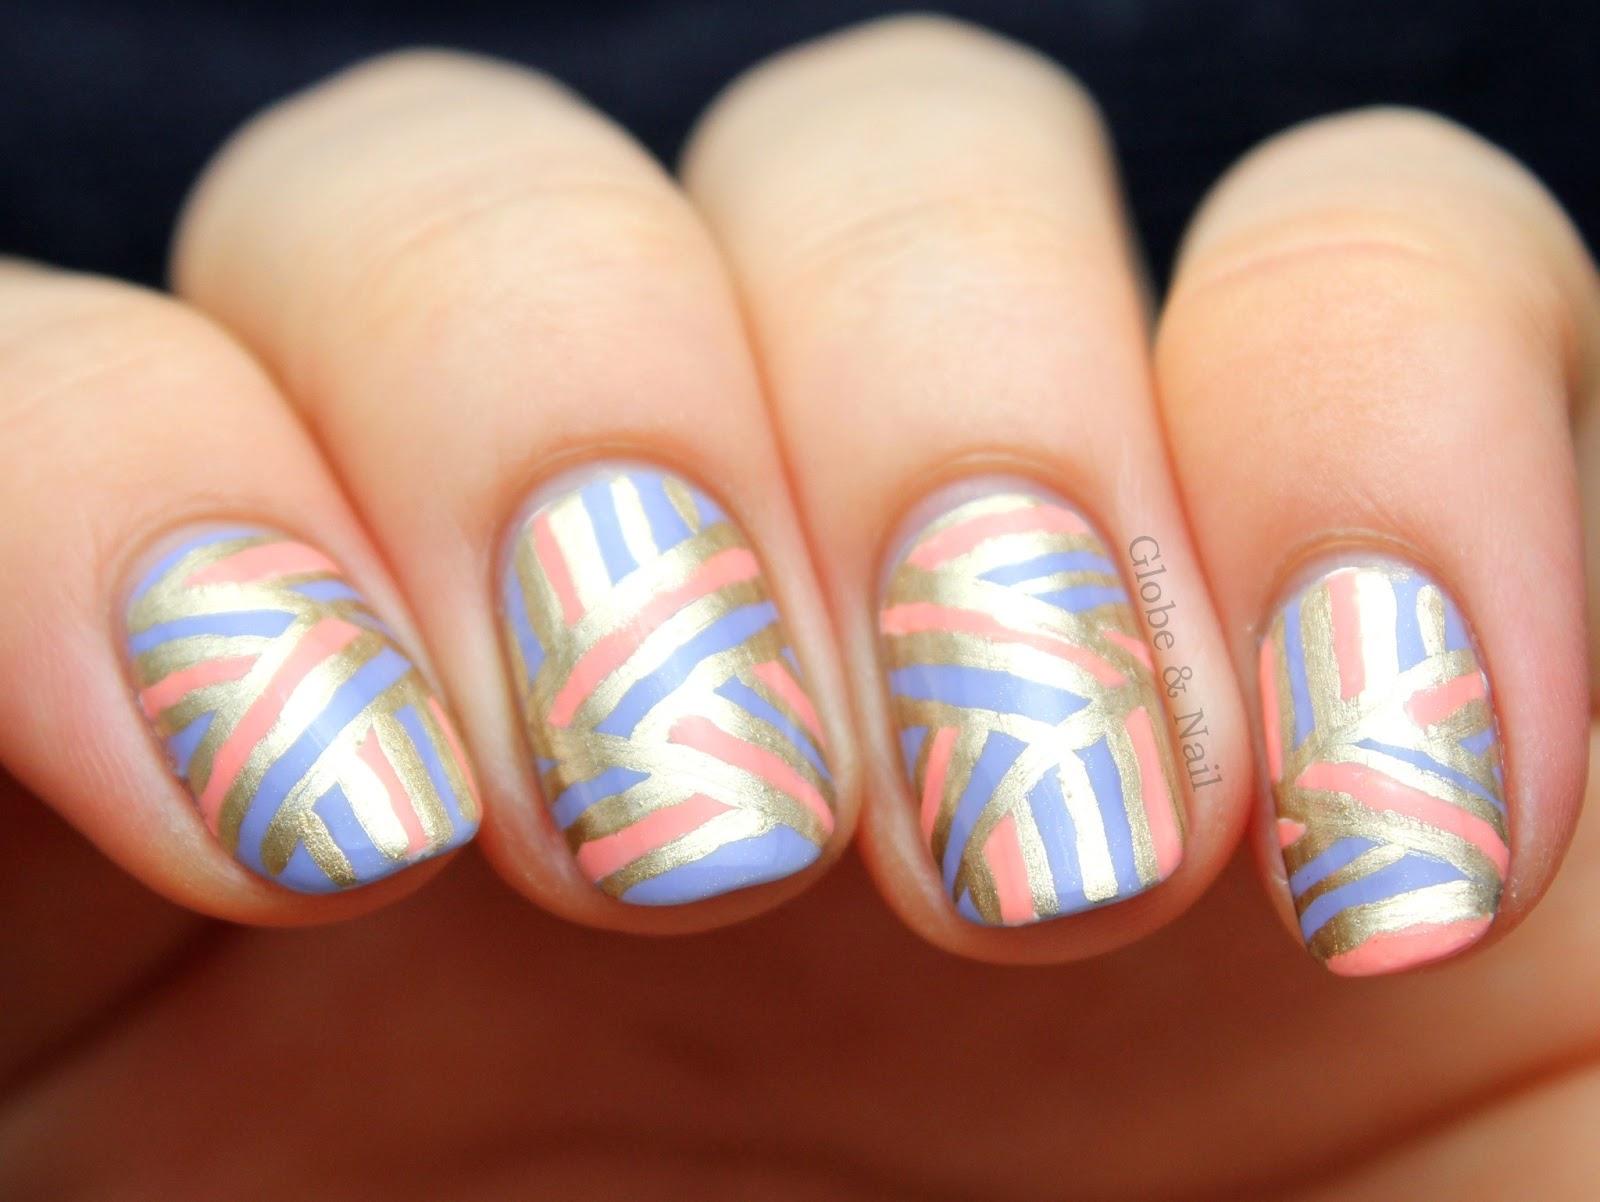 22 outstanding Round Fake Nails – ledufa.com